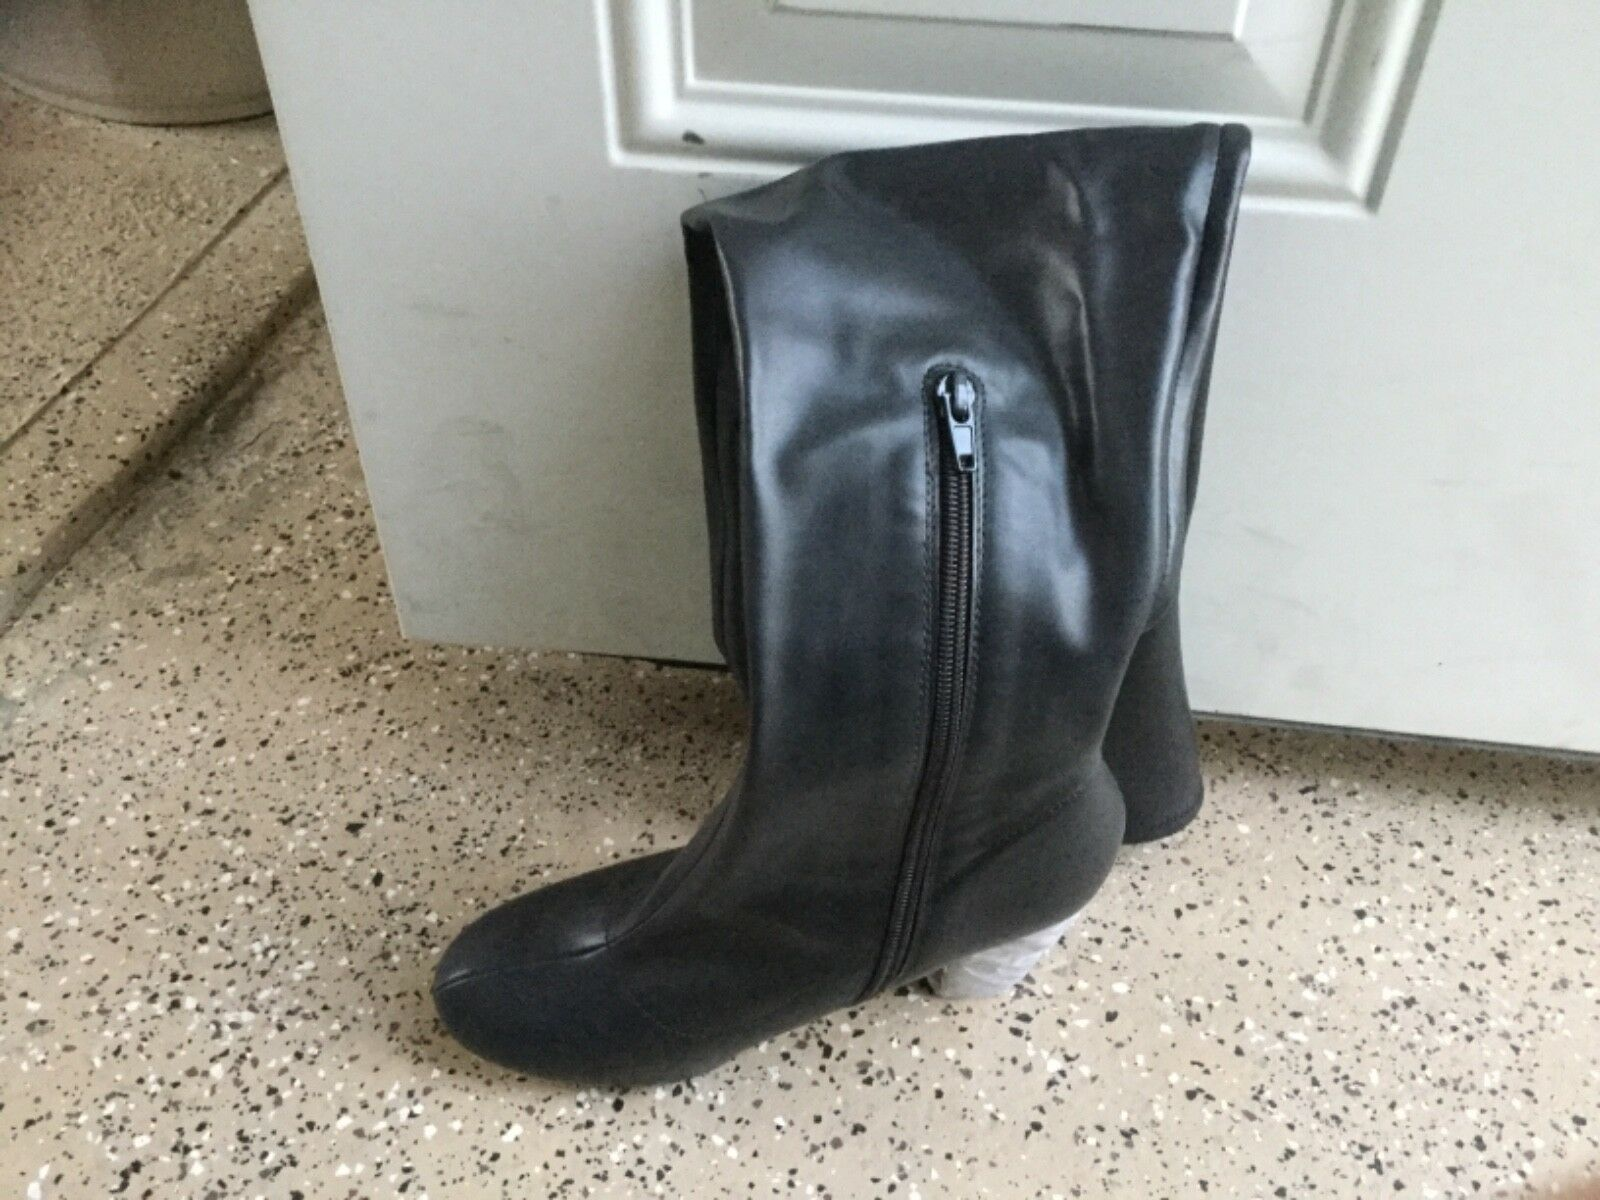 Badgley Mischka American Glamour Over The Knee Boots Sz 7.5 Regular price 89